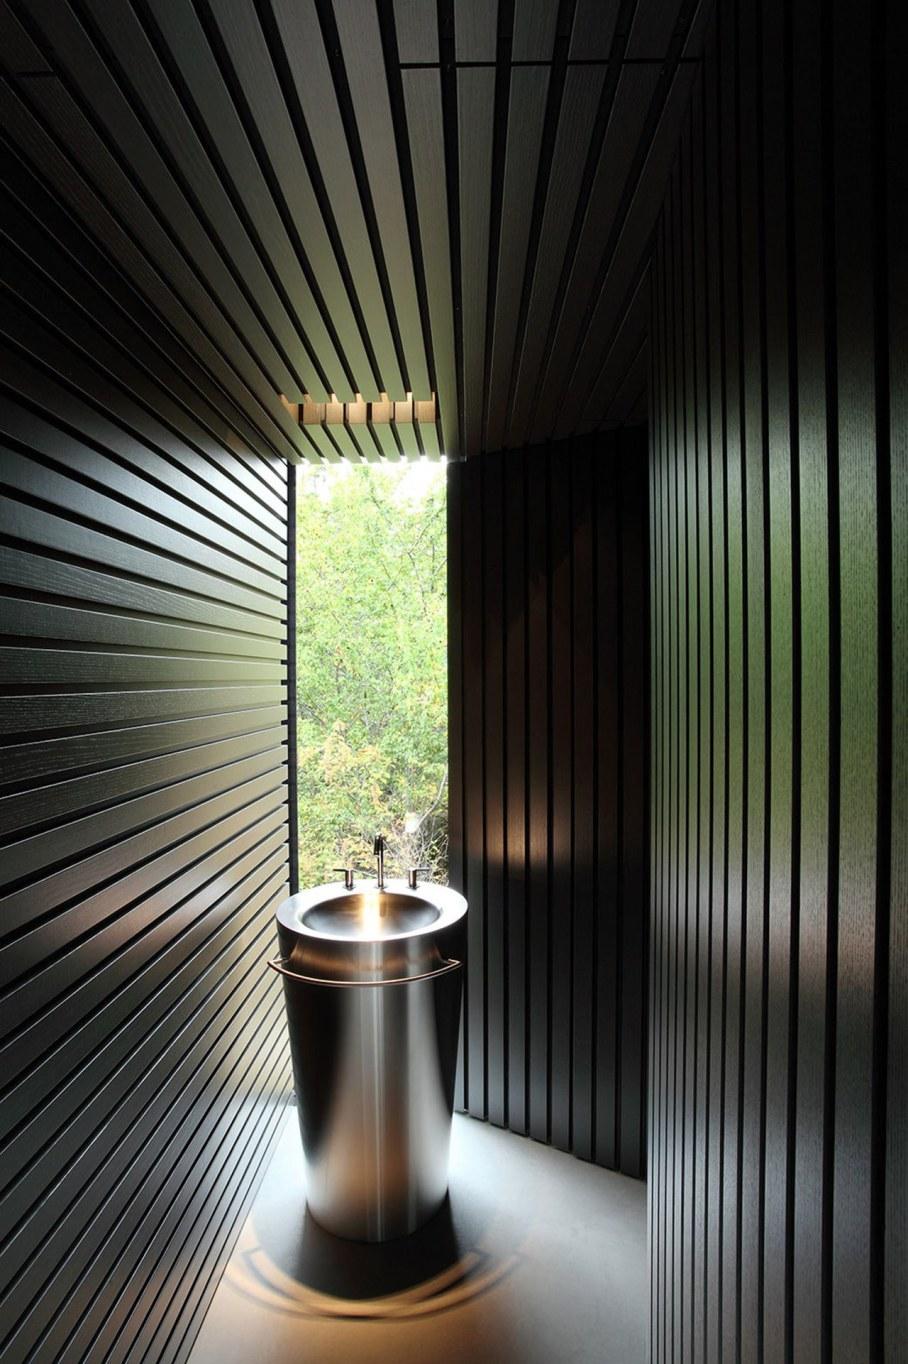 Tula House - modern bathroom